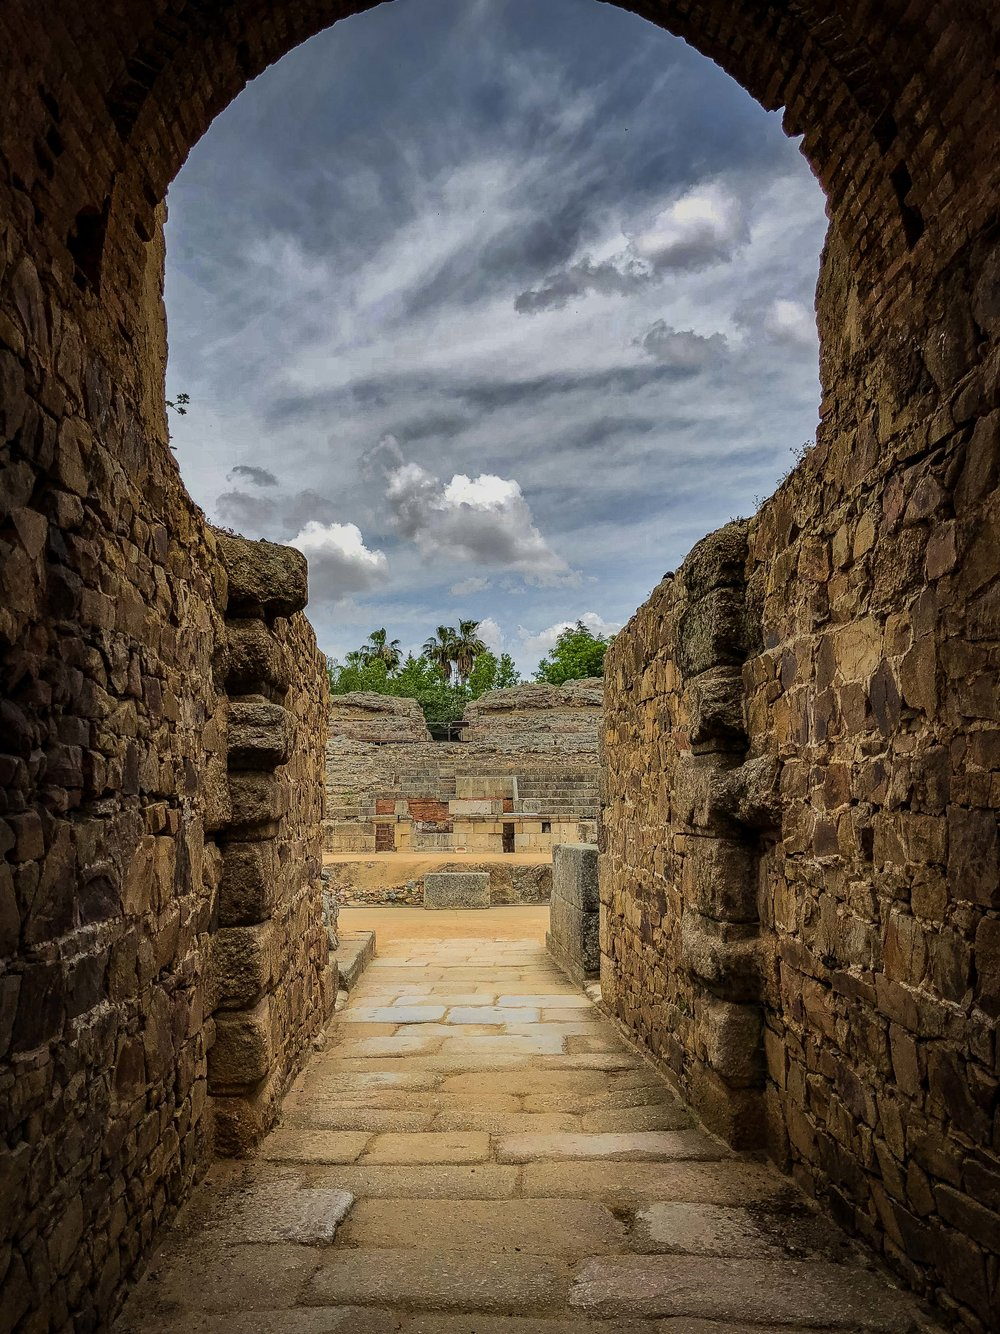 Roman Ruins. Merida, Spain 2018